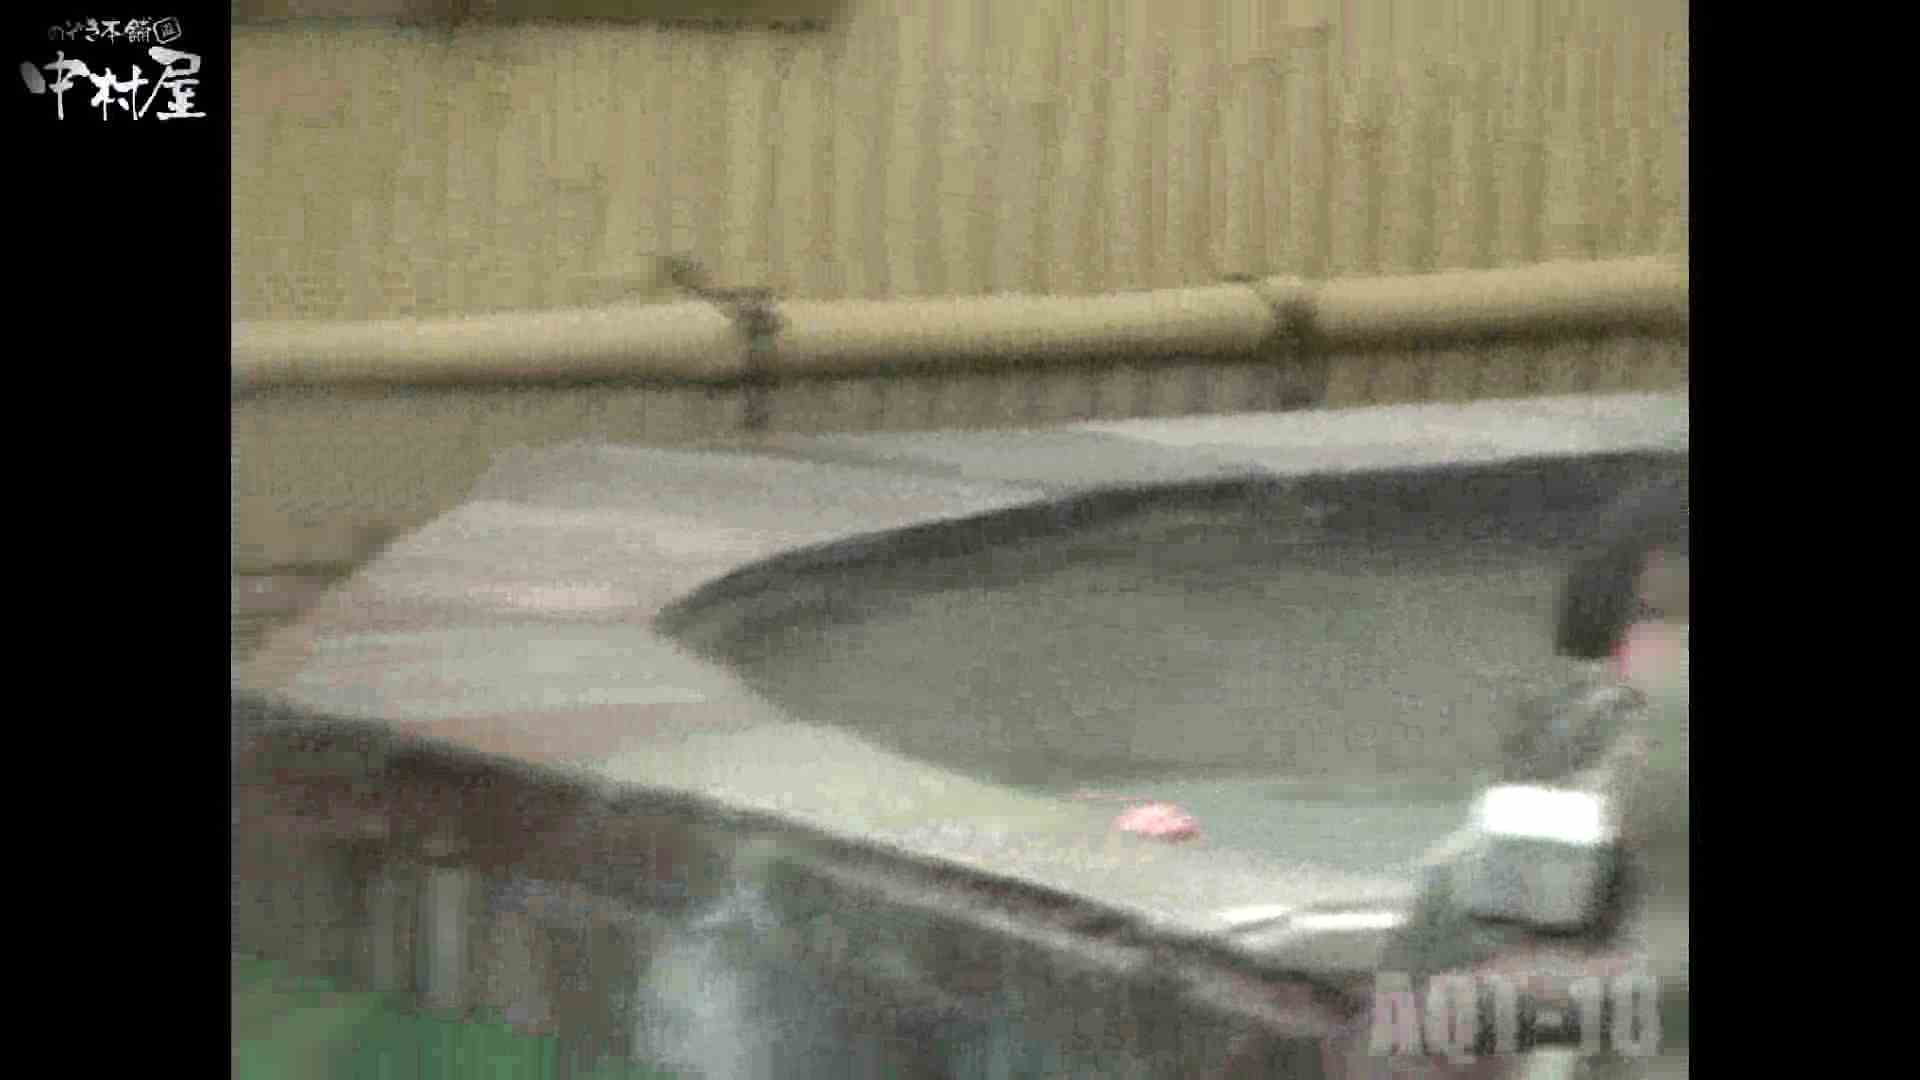 Aquaな露天風呂Vol.882潜入盗撮露天風呂十八判湯 其の五 0   0  82連発 3